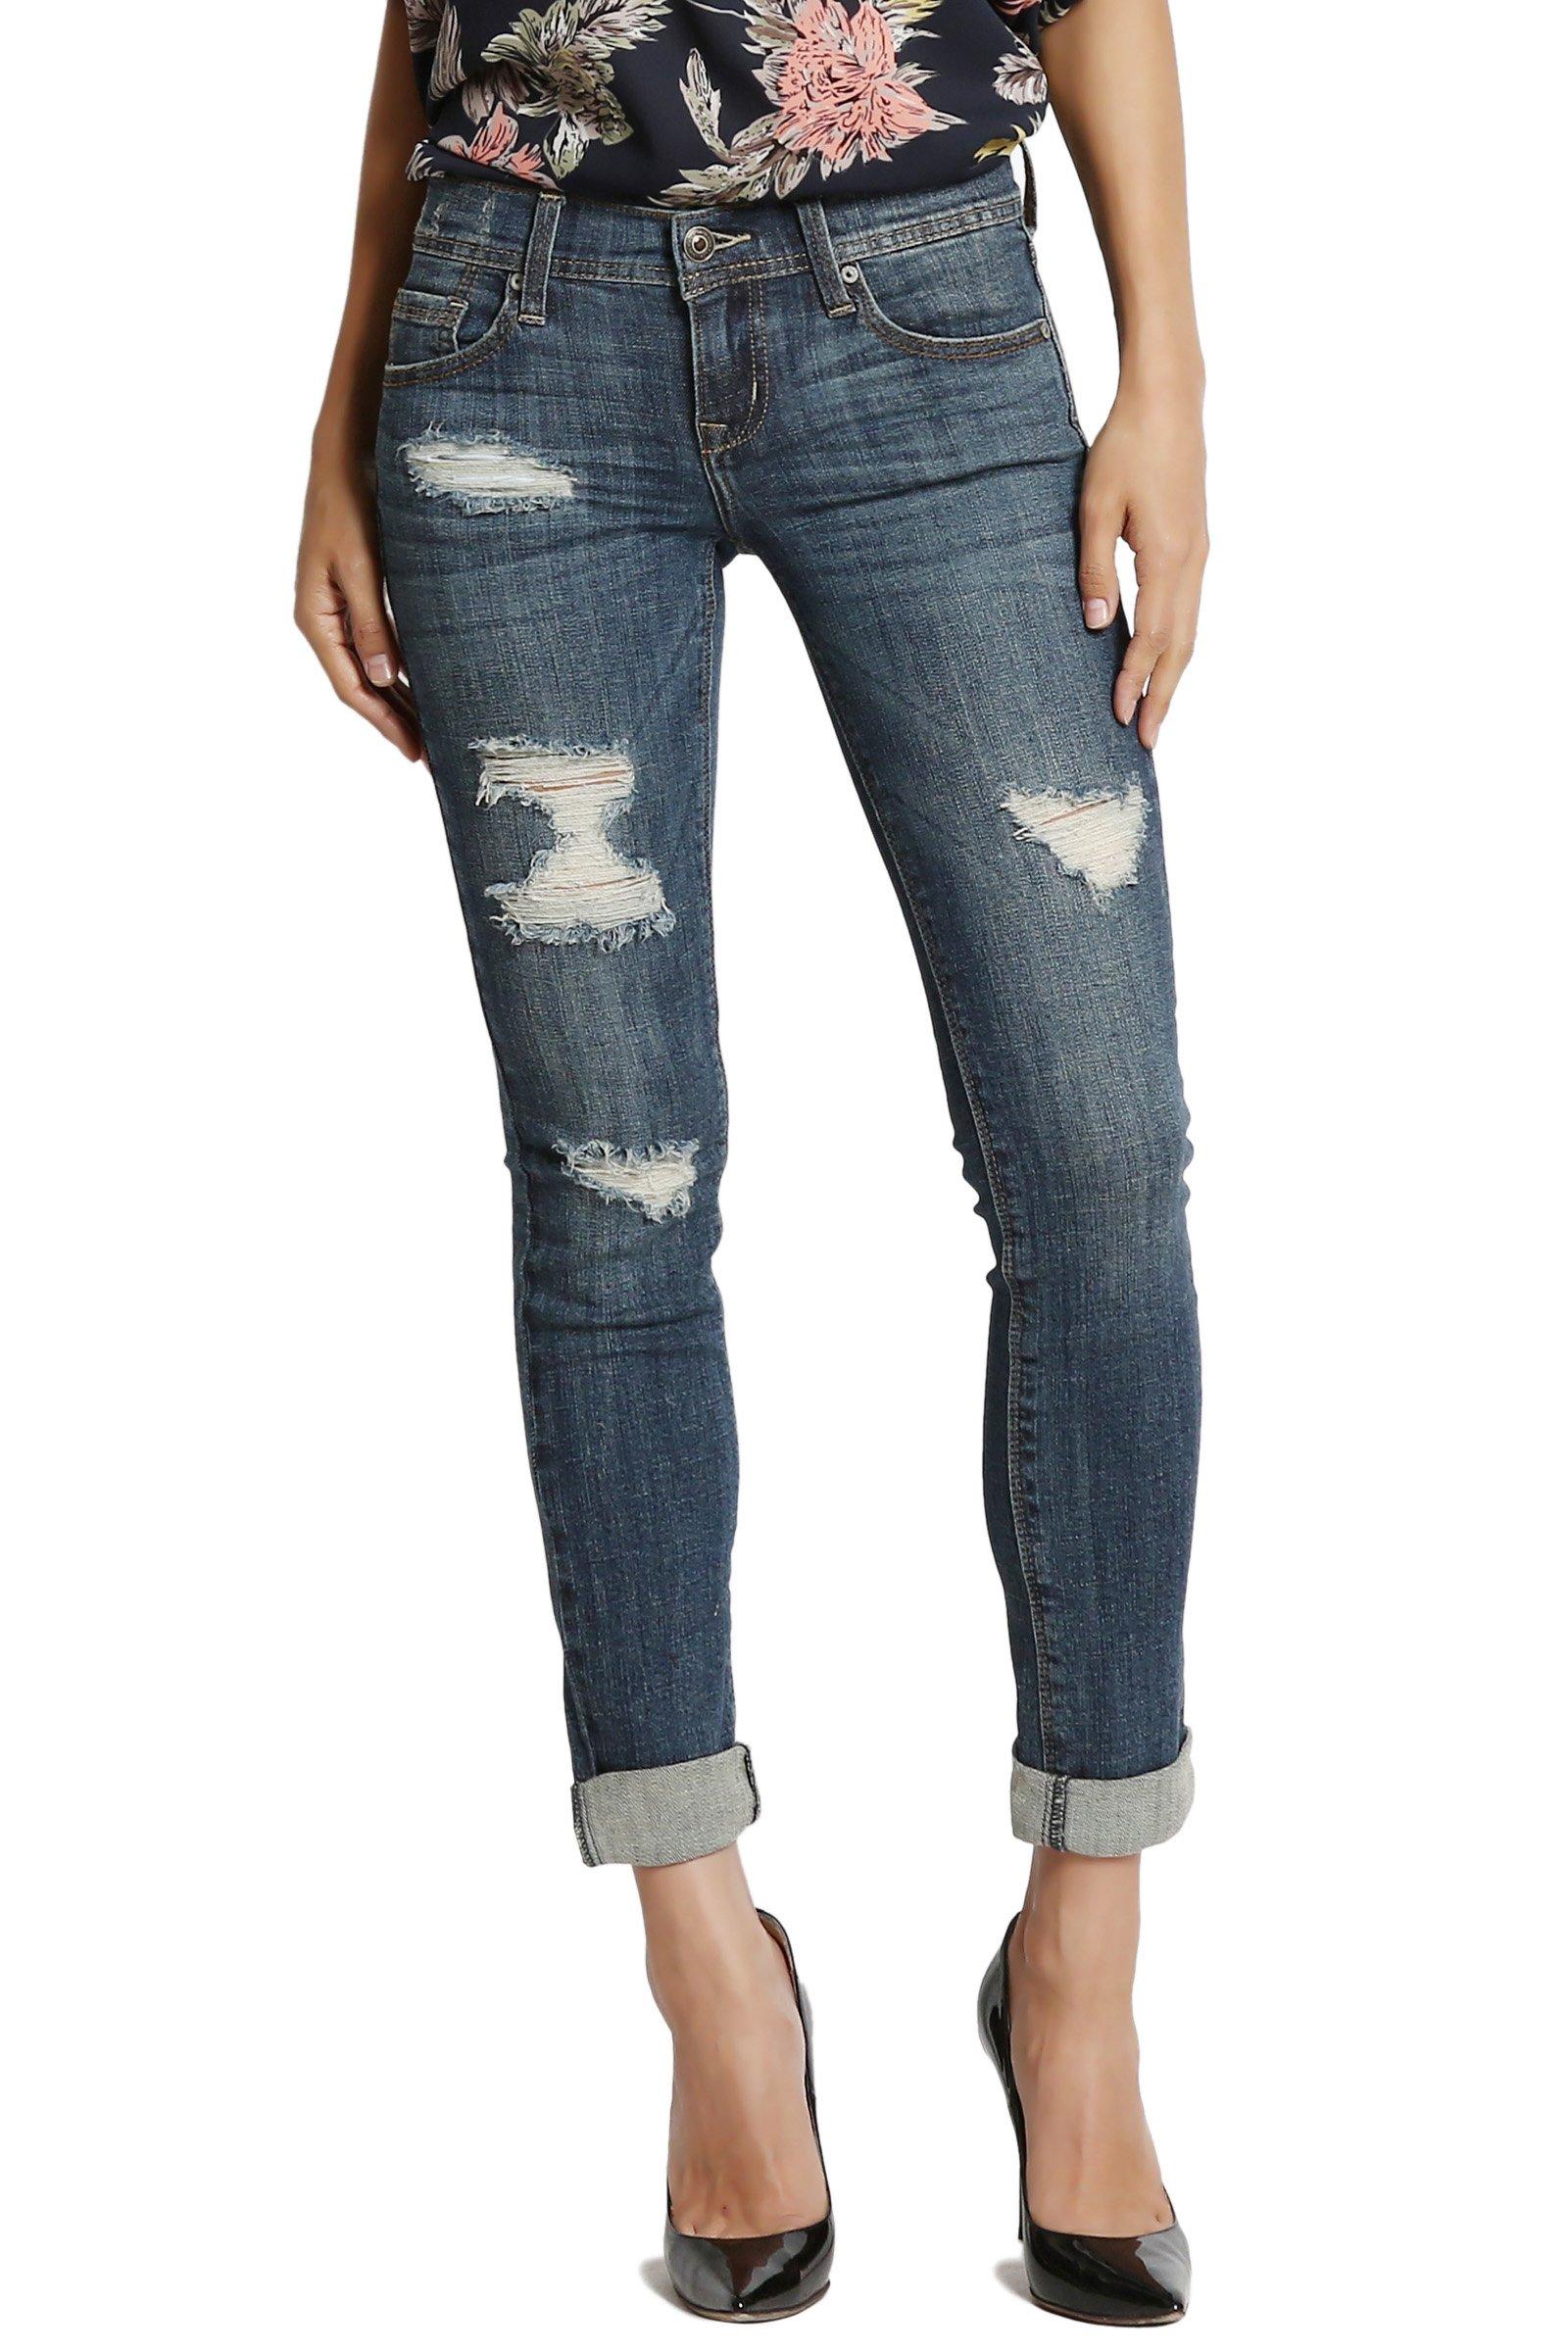 70ae95e3209 TheMogan Vintage Distressed Washed Stretch Denim Skinny Jeans ...